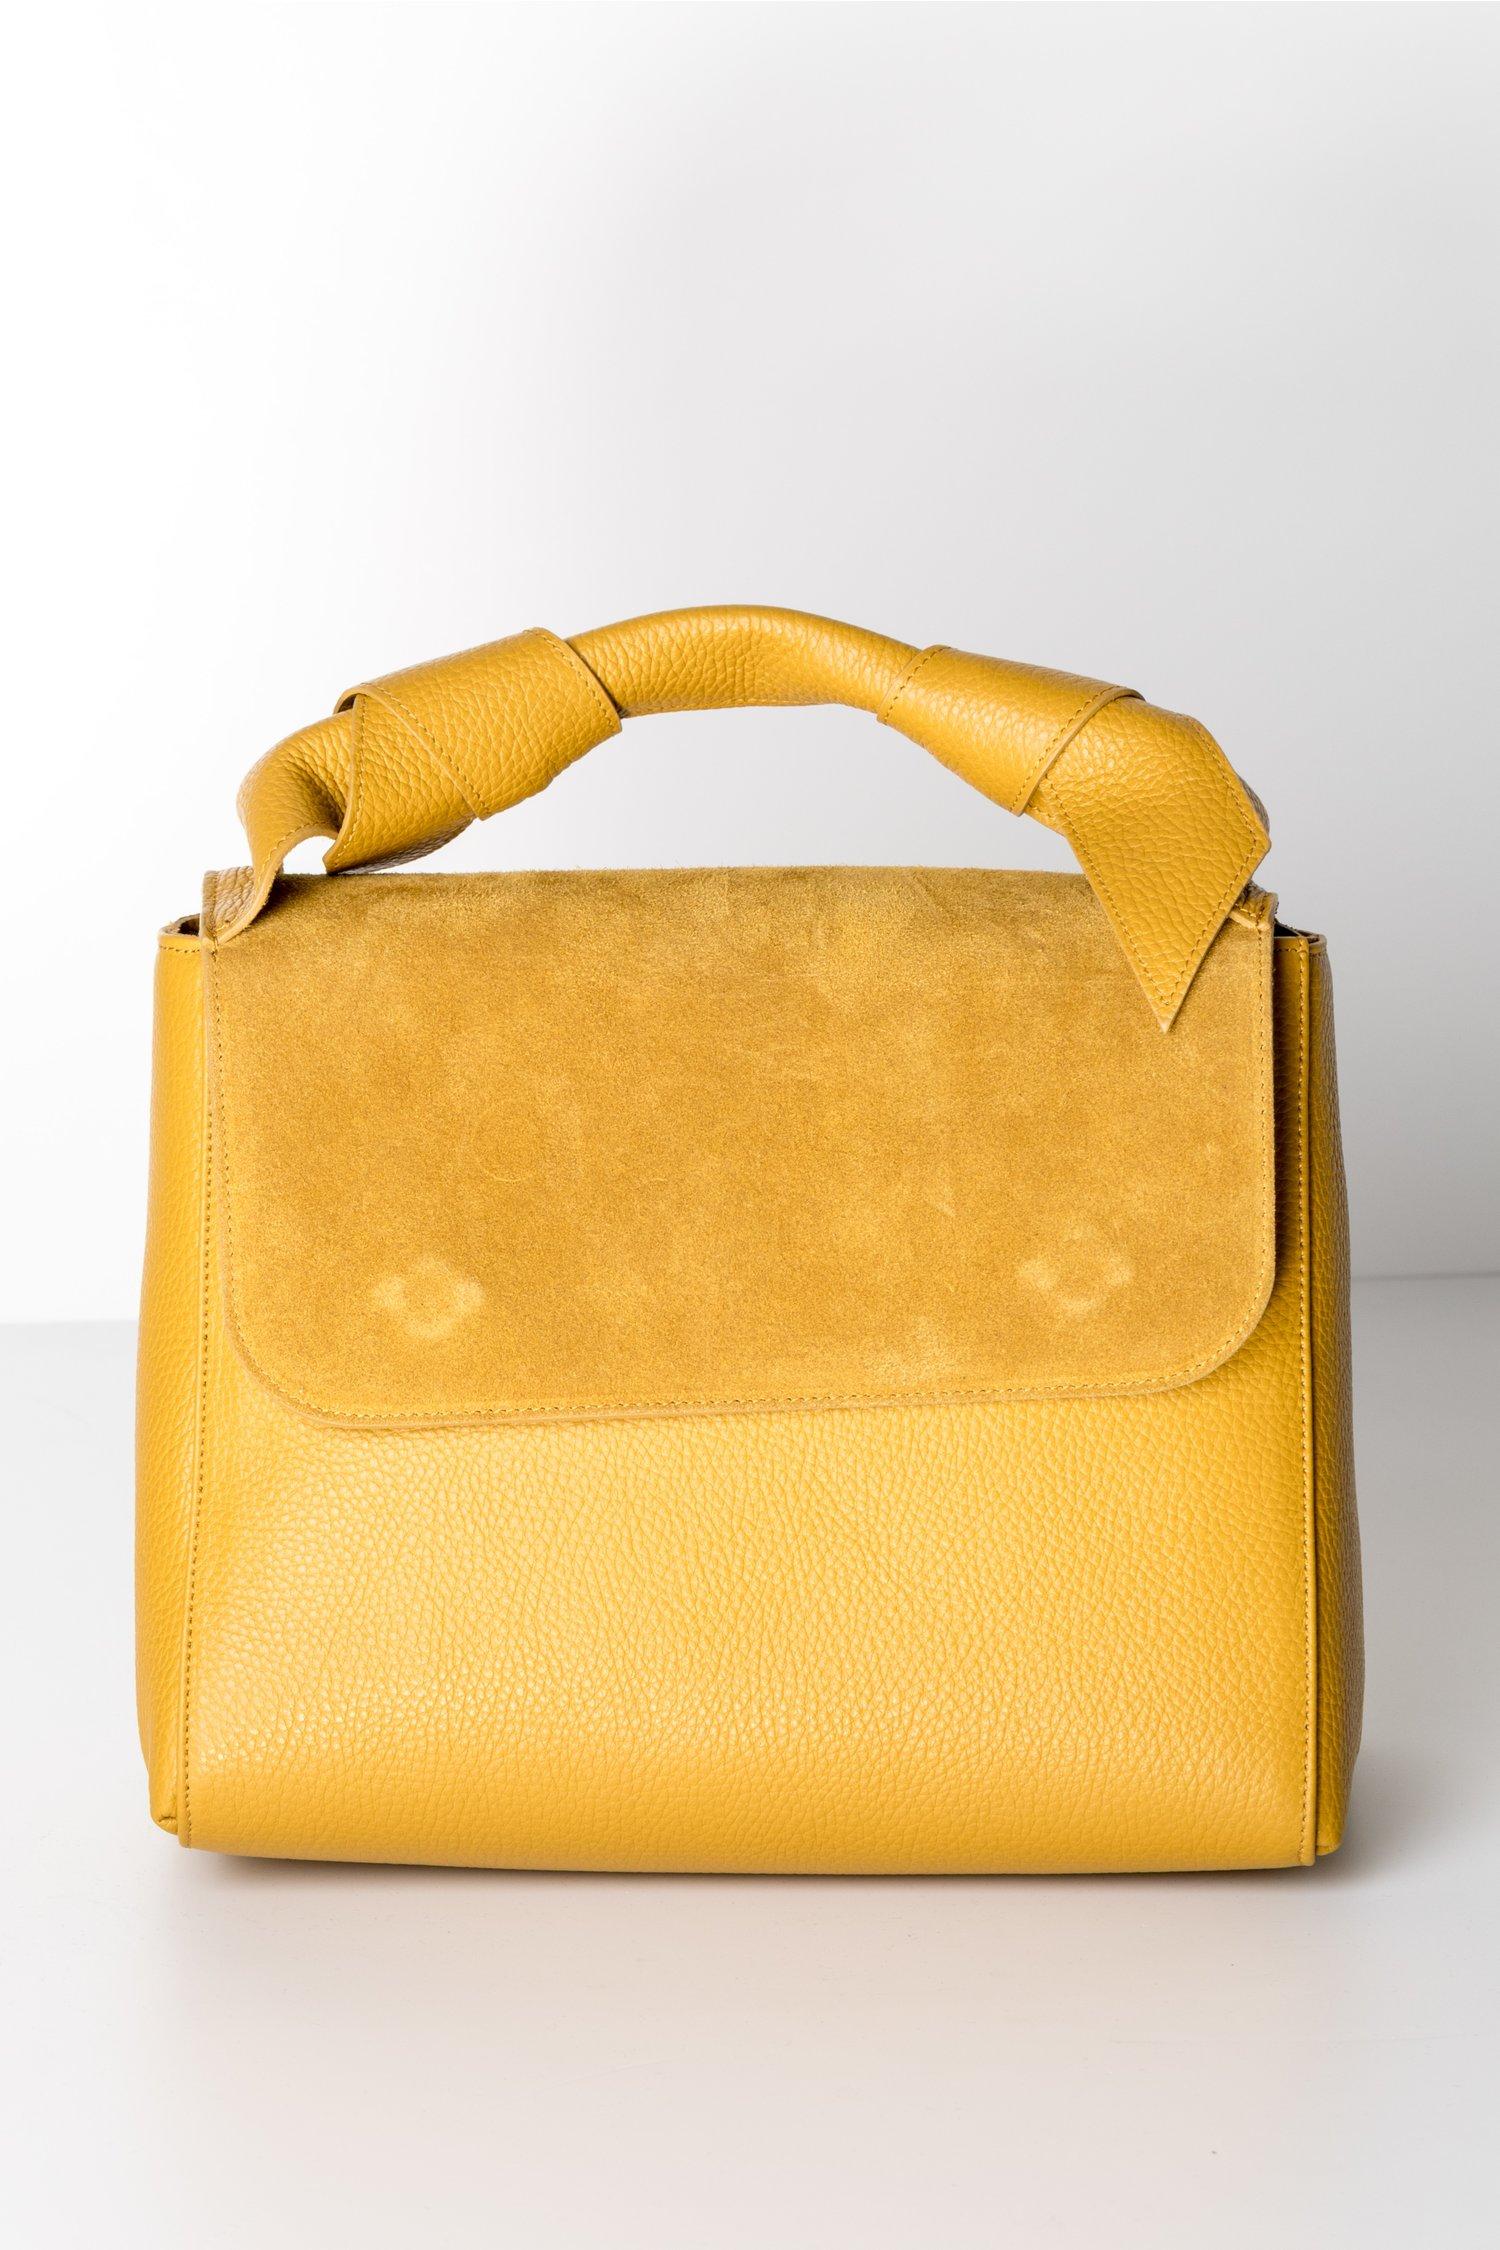 Geanta galben mustar din piele naturala cu aplicatii la maner